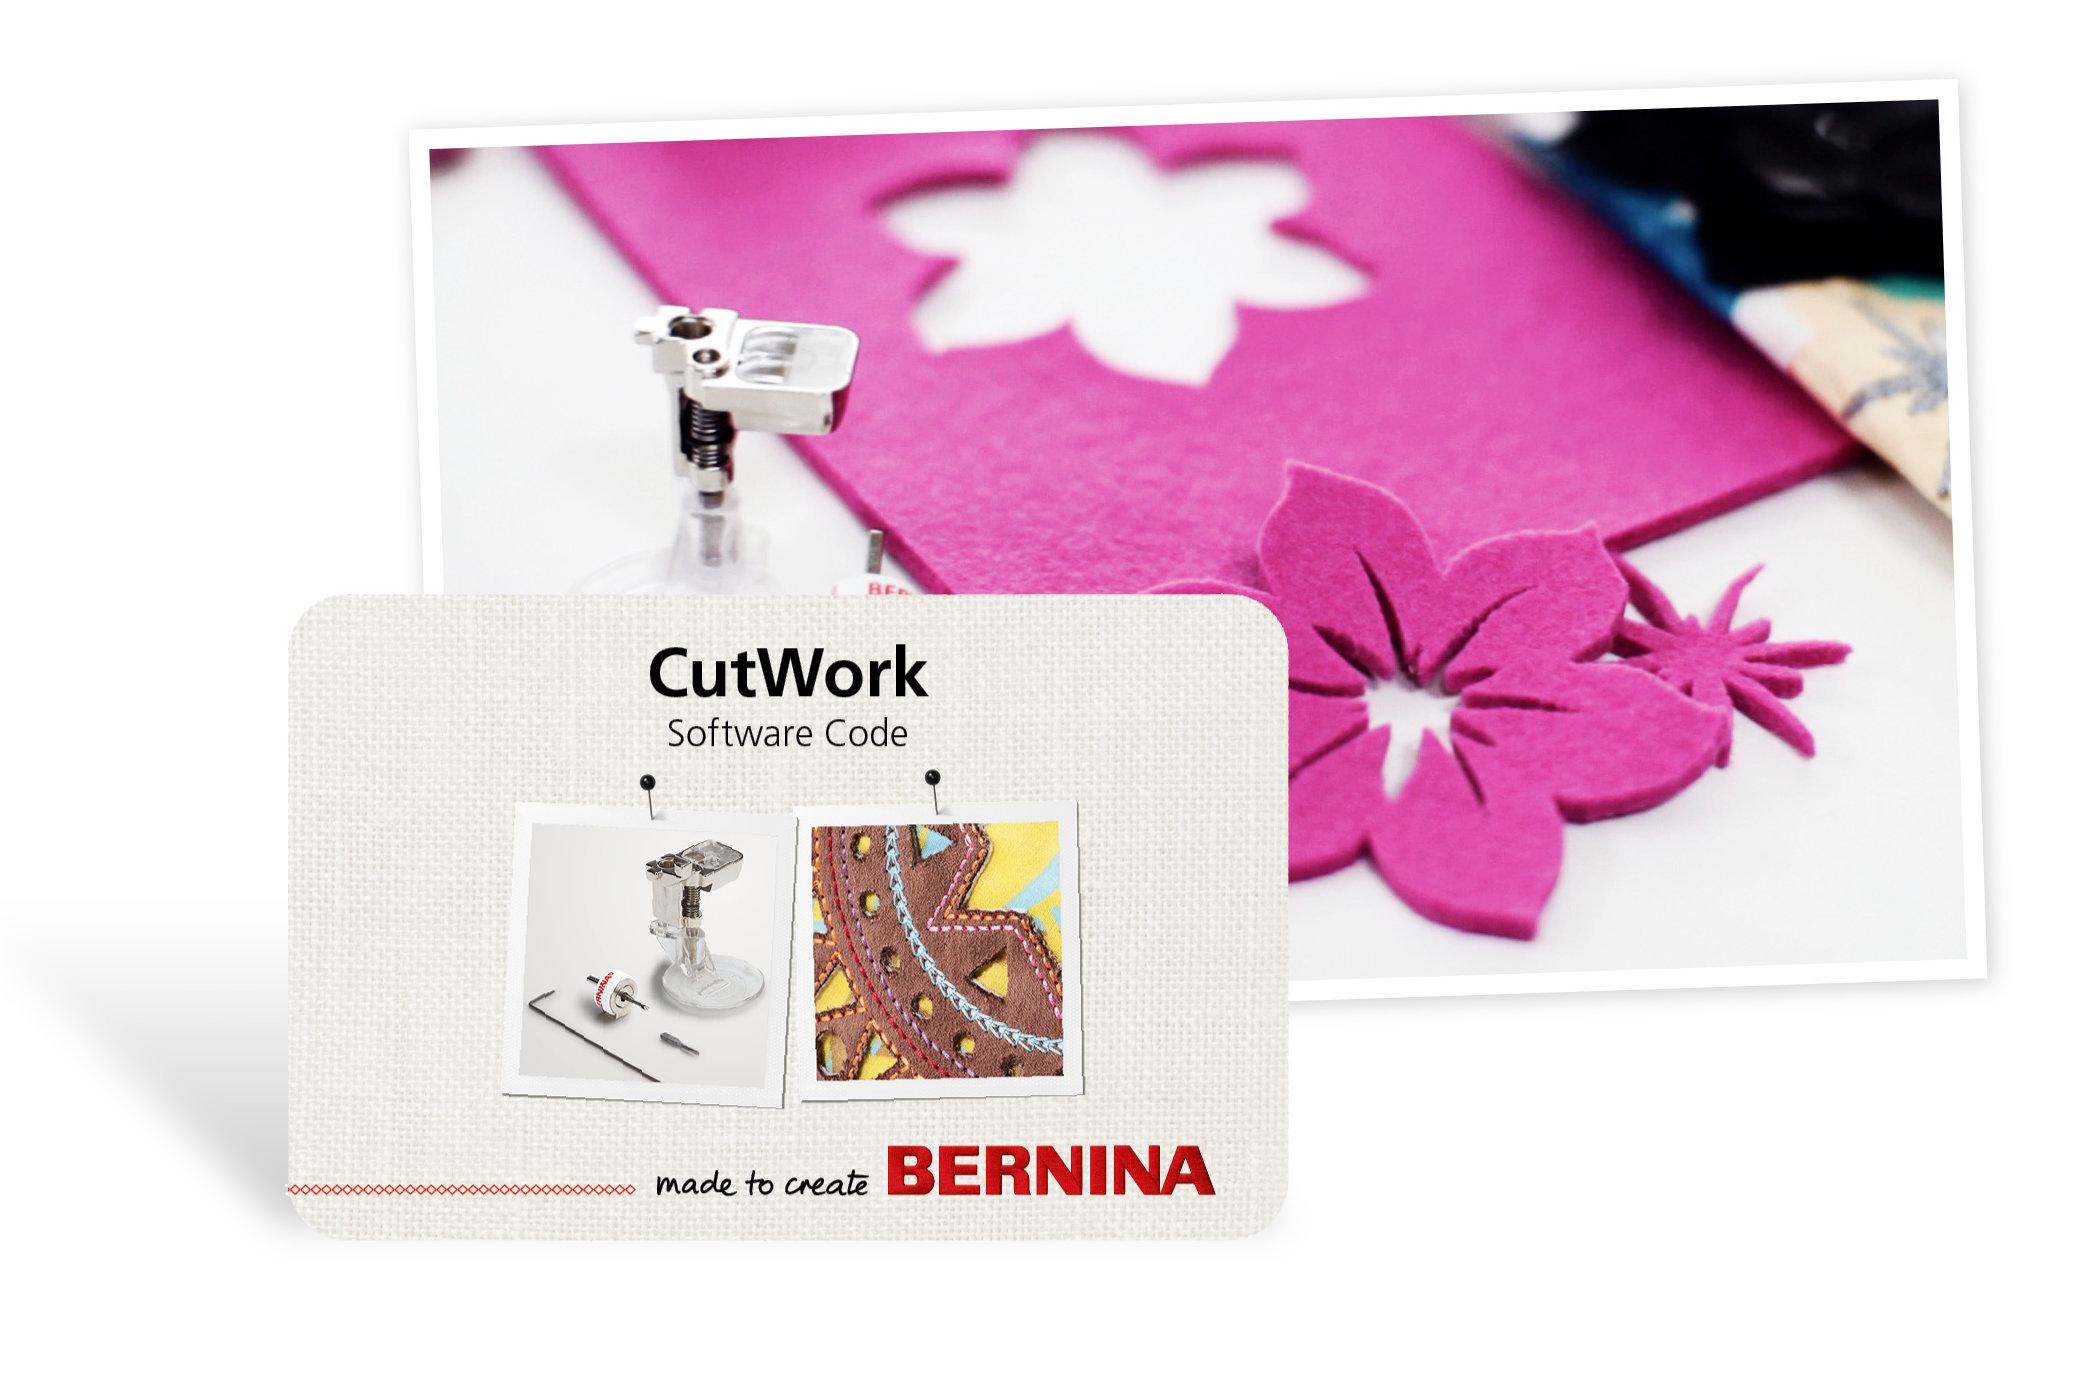 BERNINA CutWork: Creative Design Software